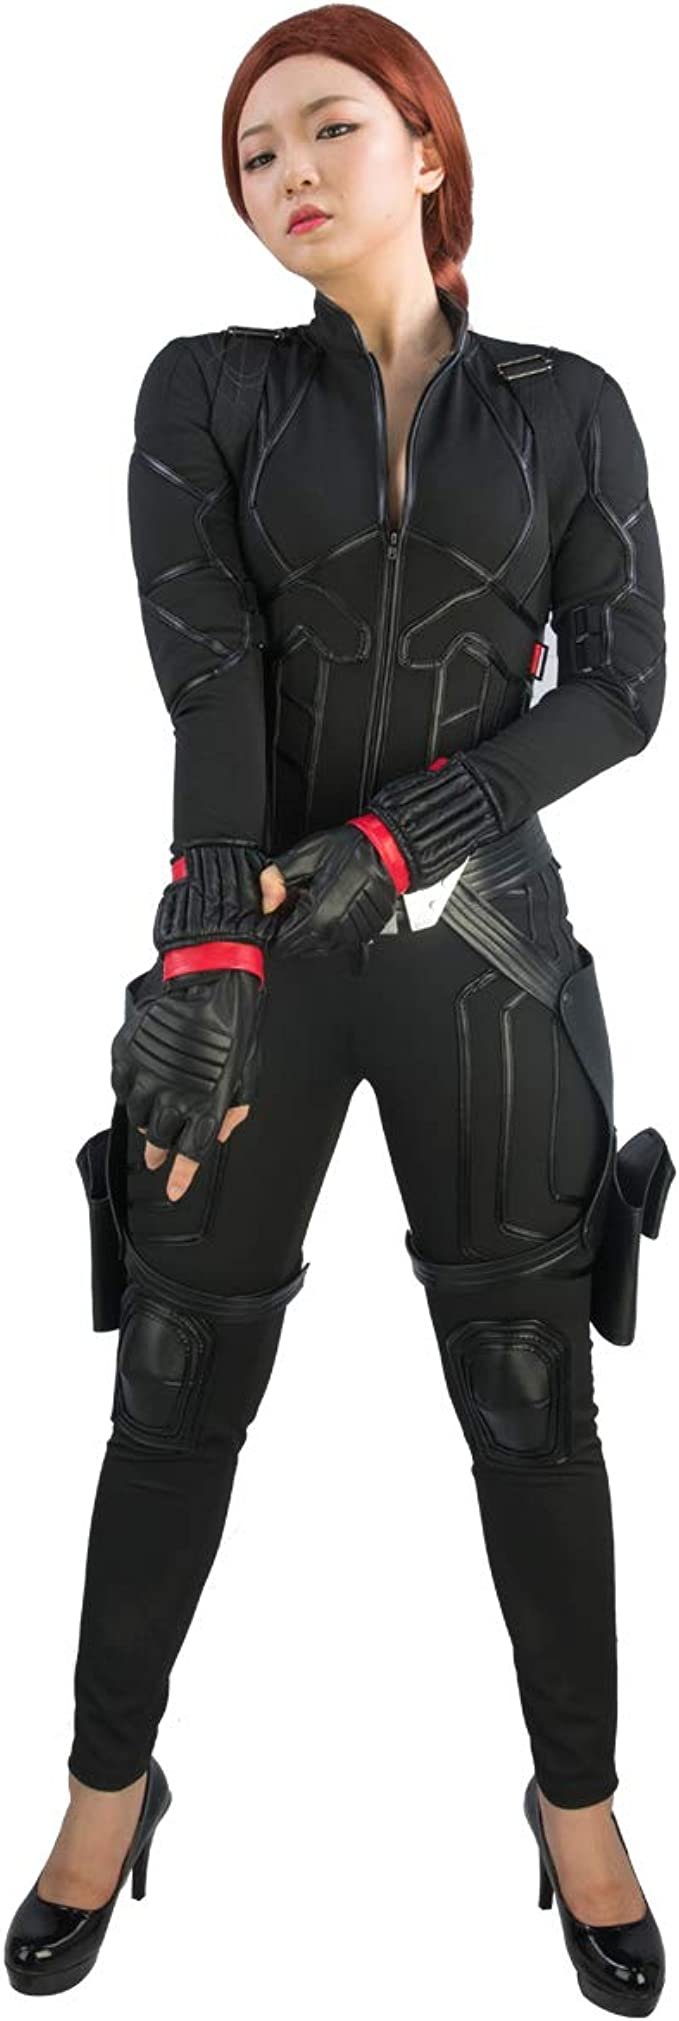 Wellgift Disfraz de Viuda Negra, Disfraz de Escarlata para Cosplay ...